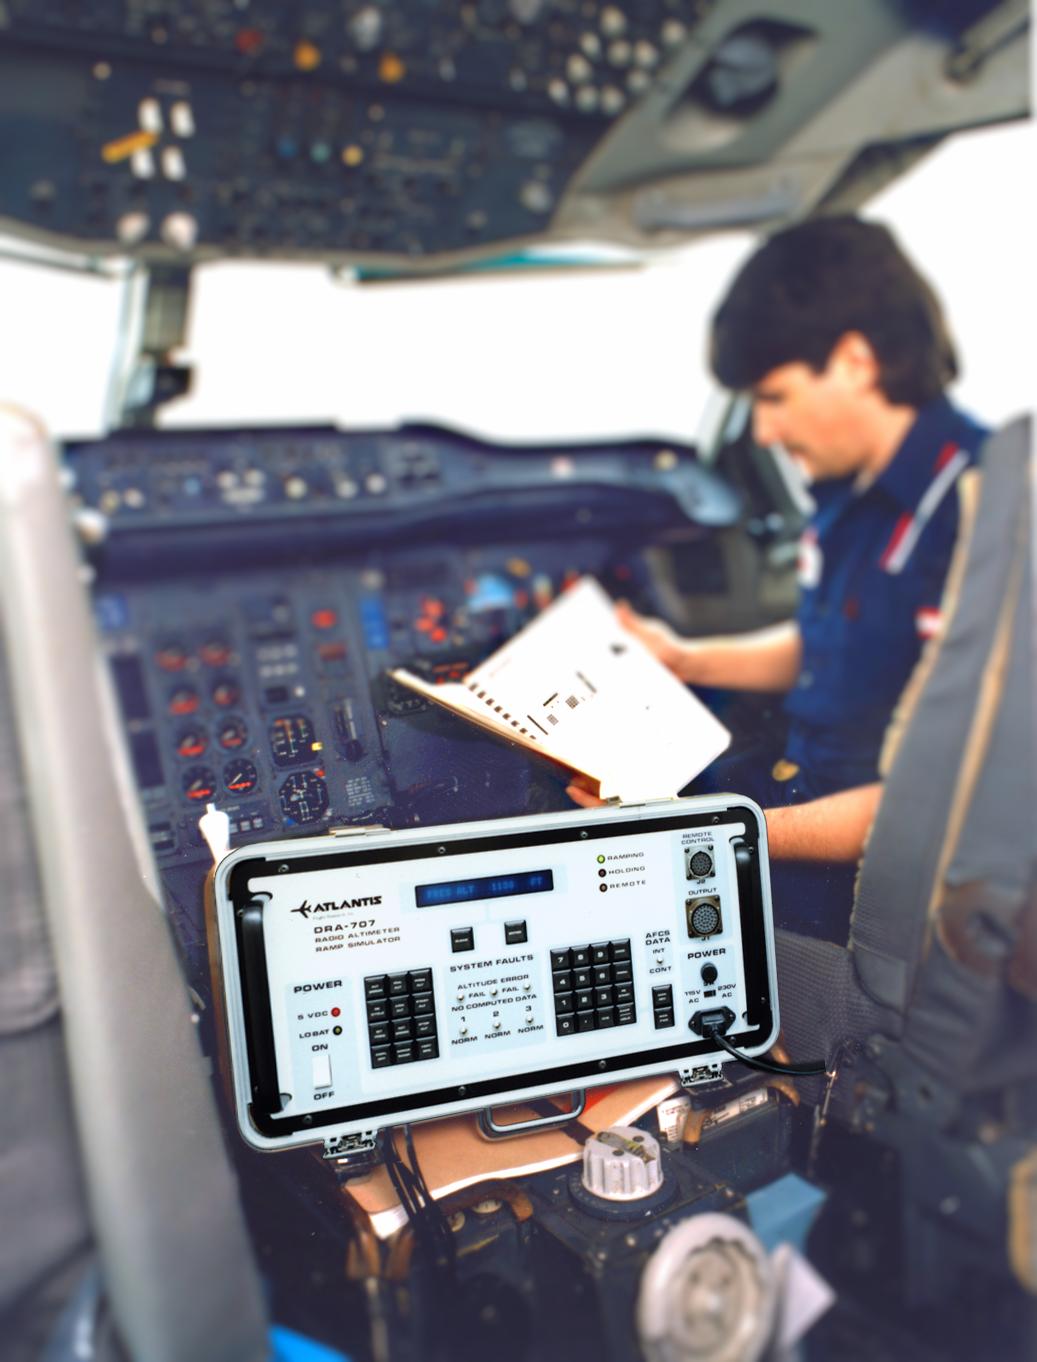 DRA-707 Digital Radio Altimeter Test Set